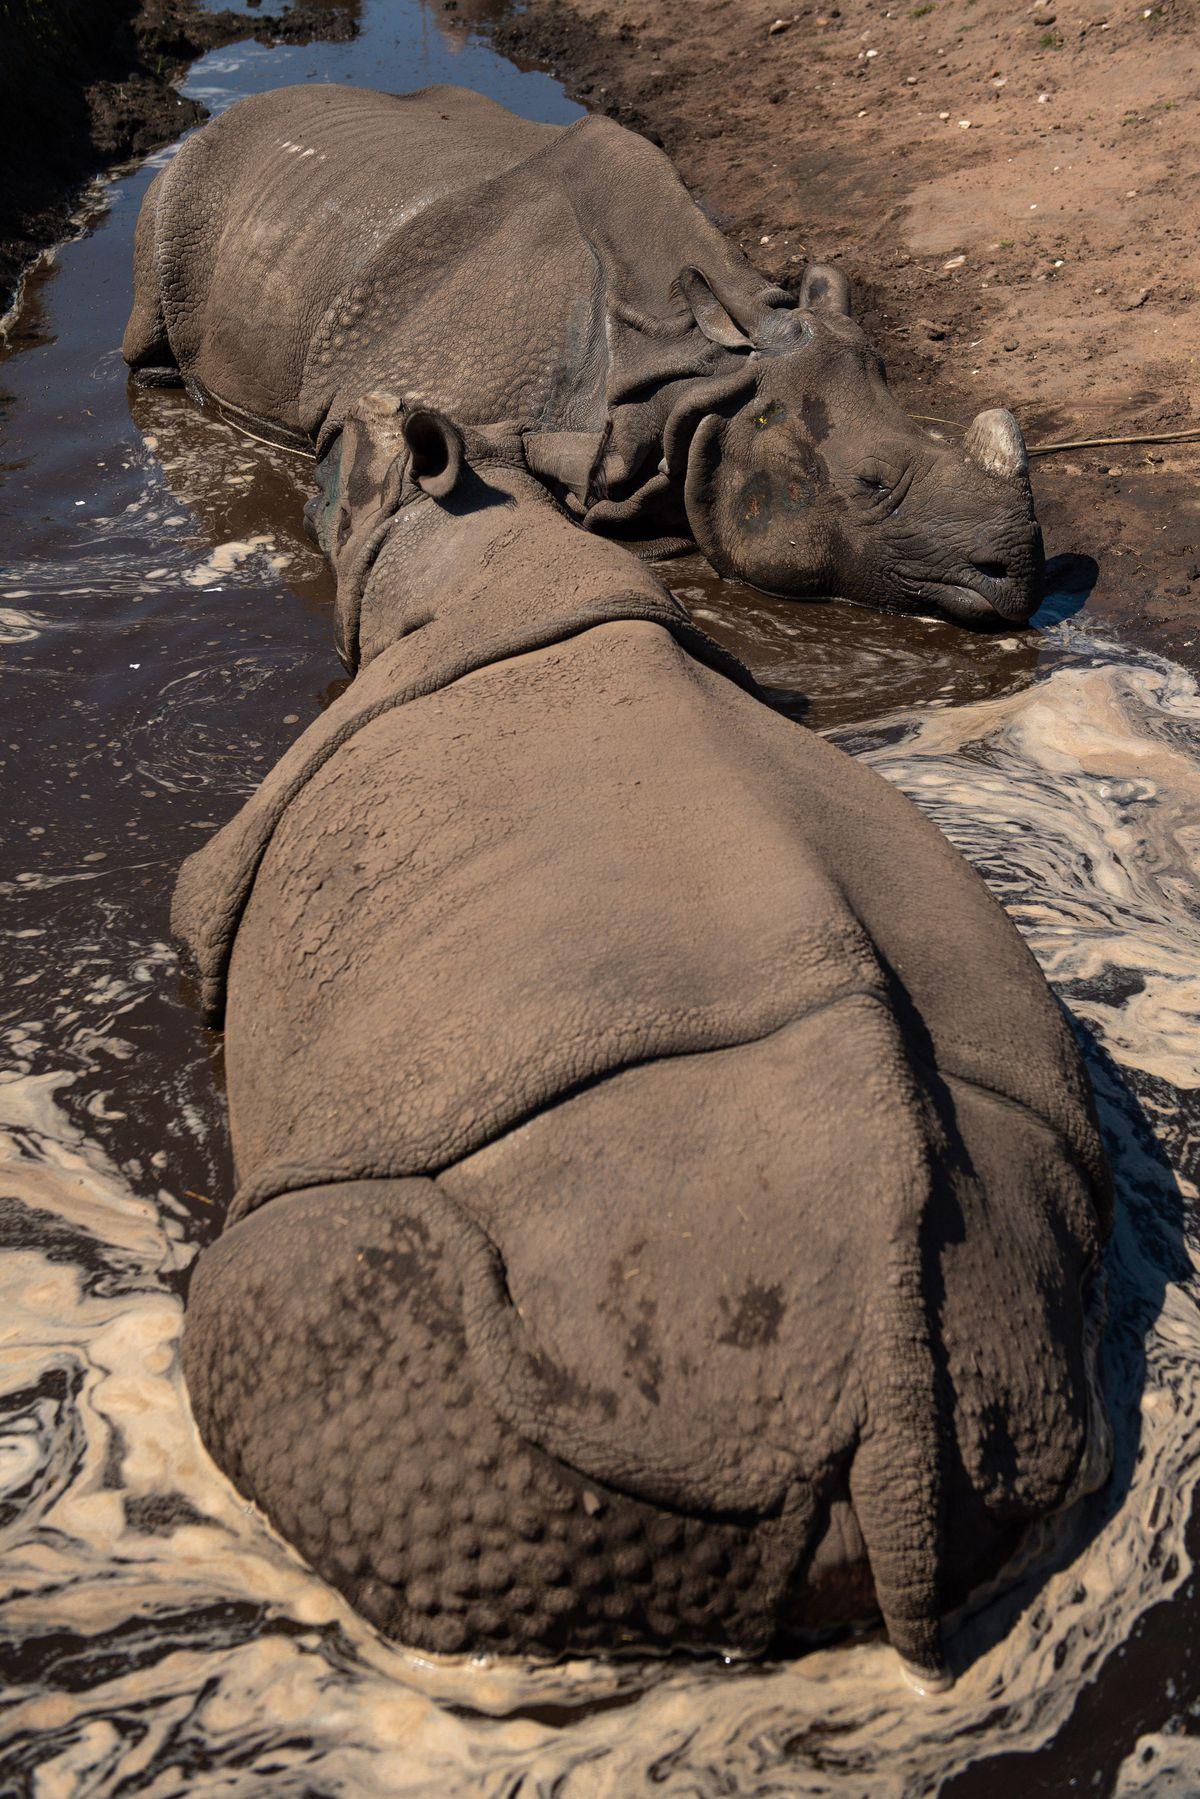 Indian rhinoceros Sunanda and Seto cool down